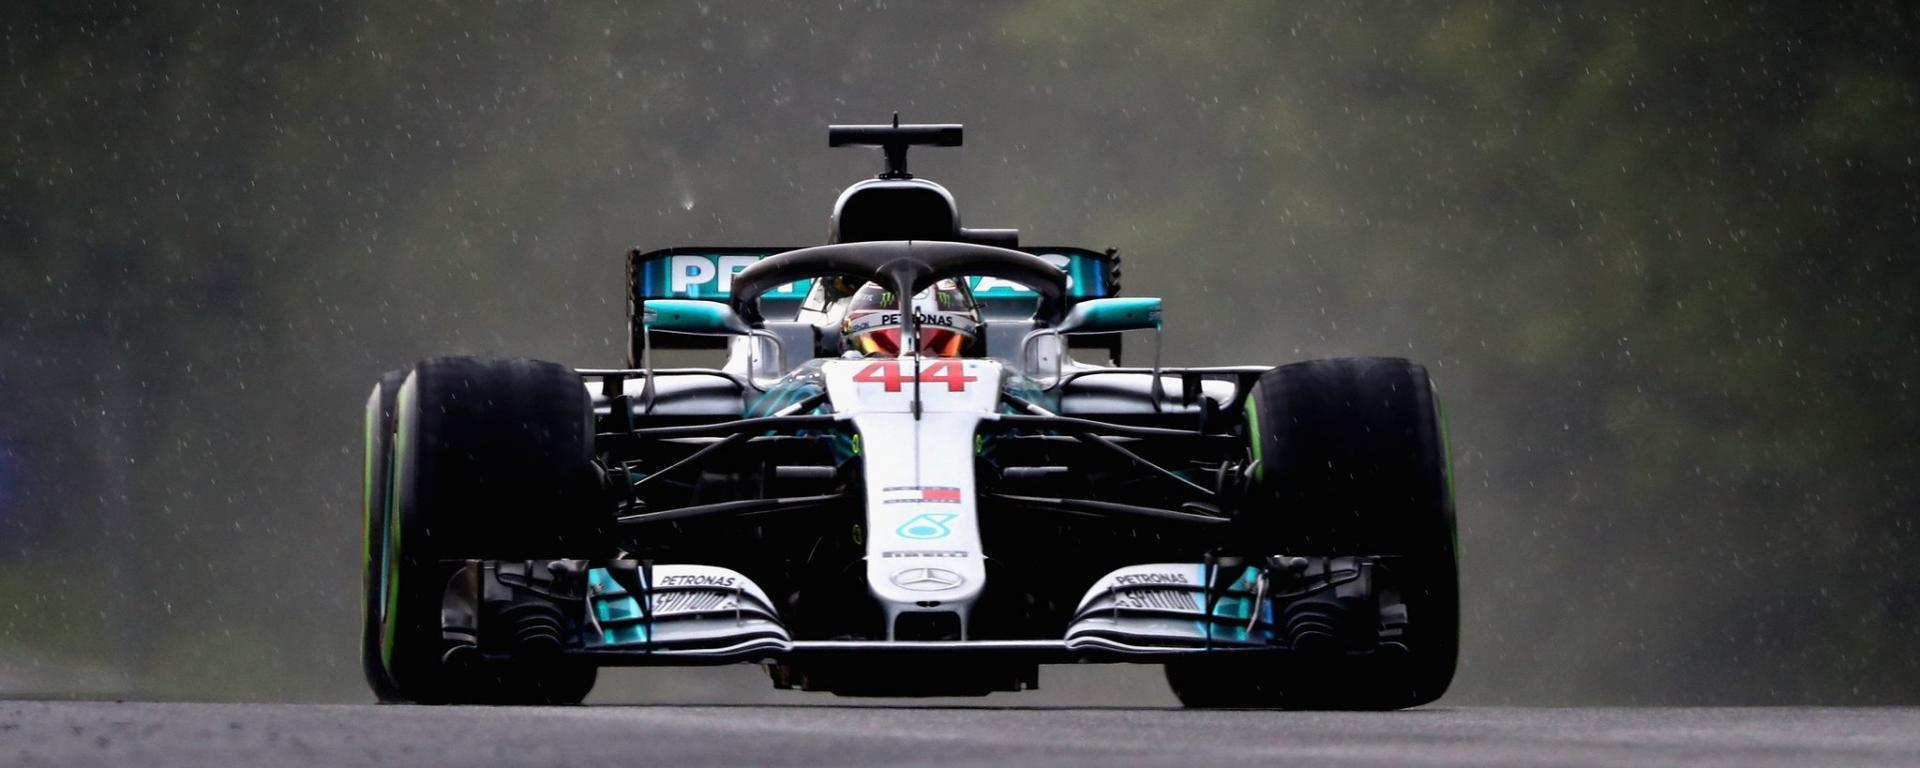 Pagelle Gran Premio D'Ungheria 2018